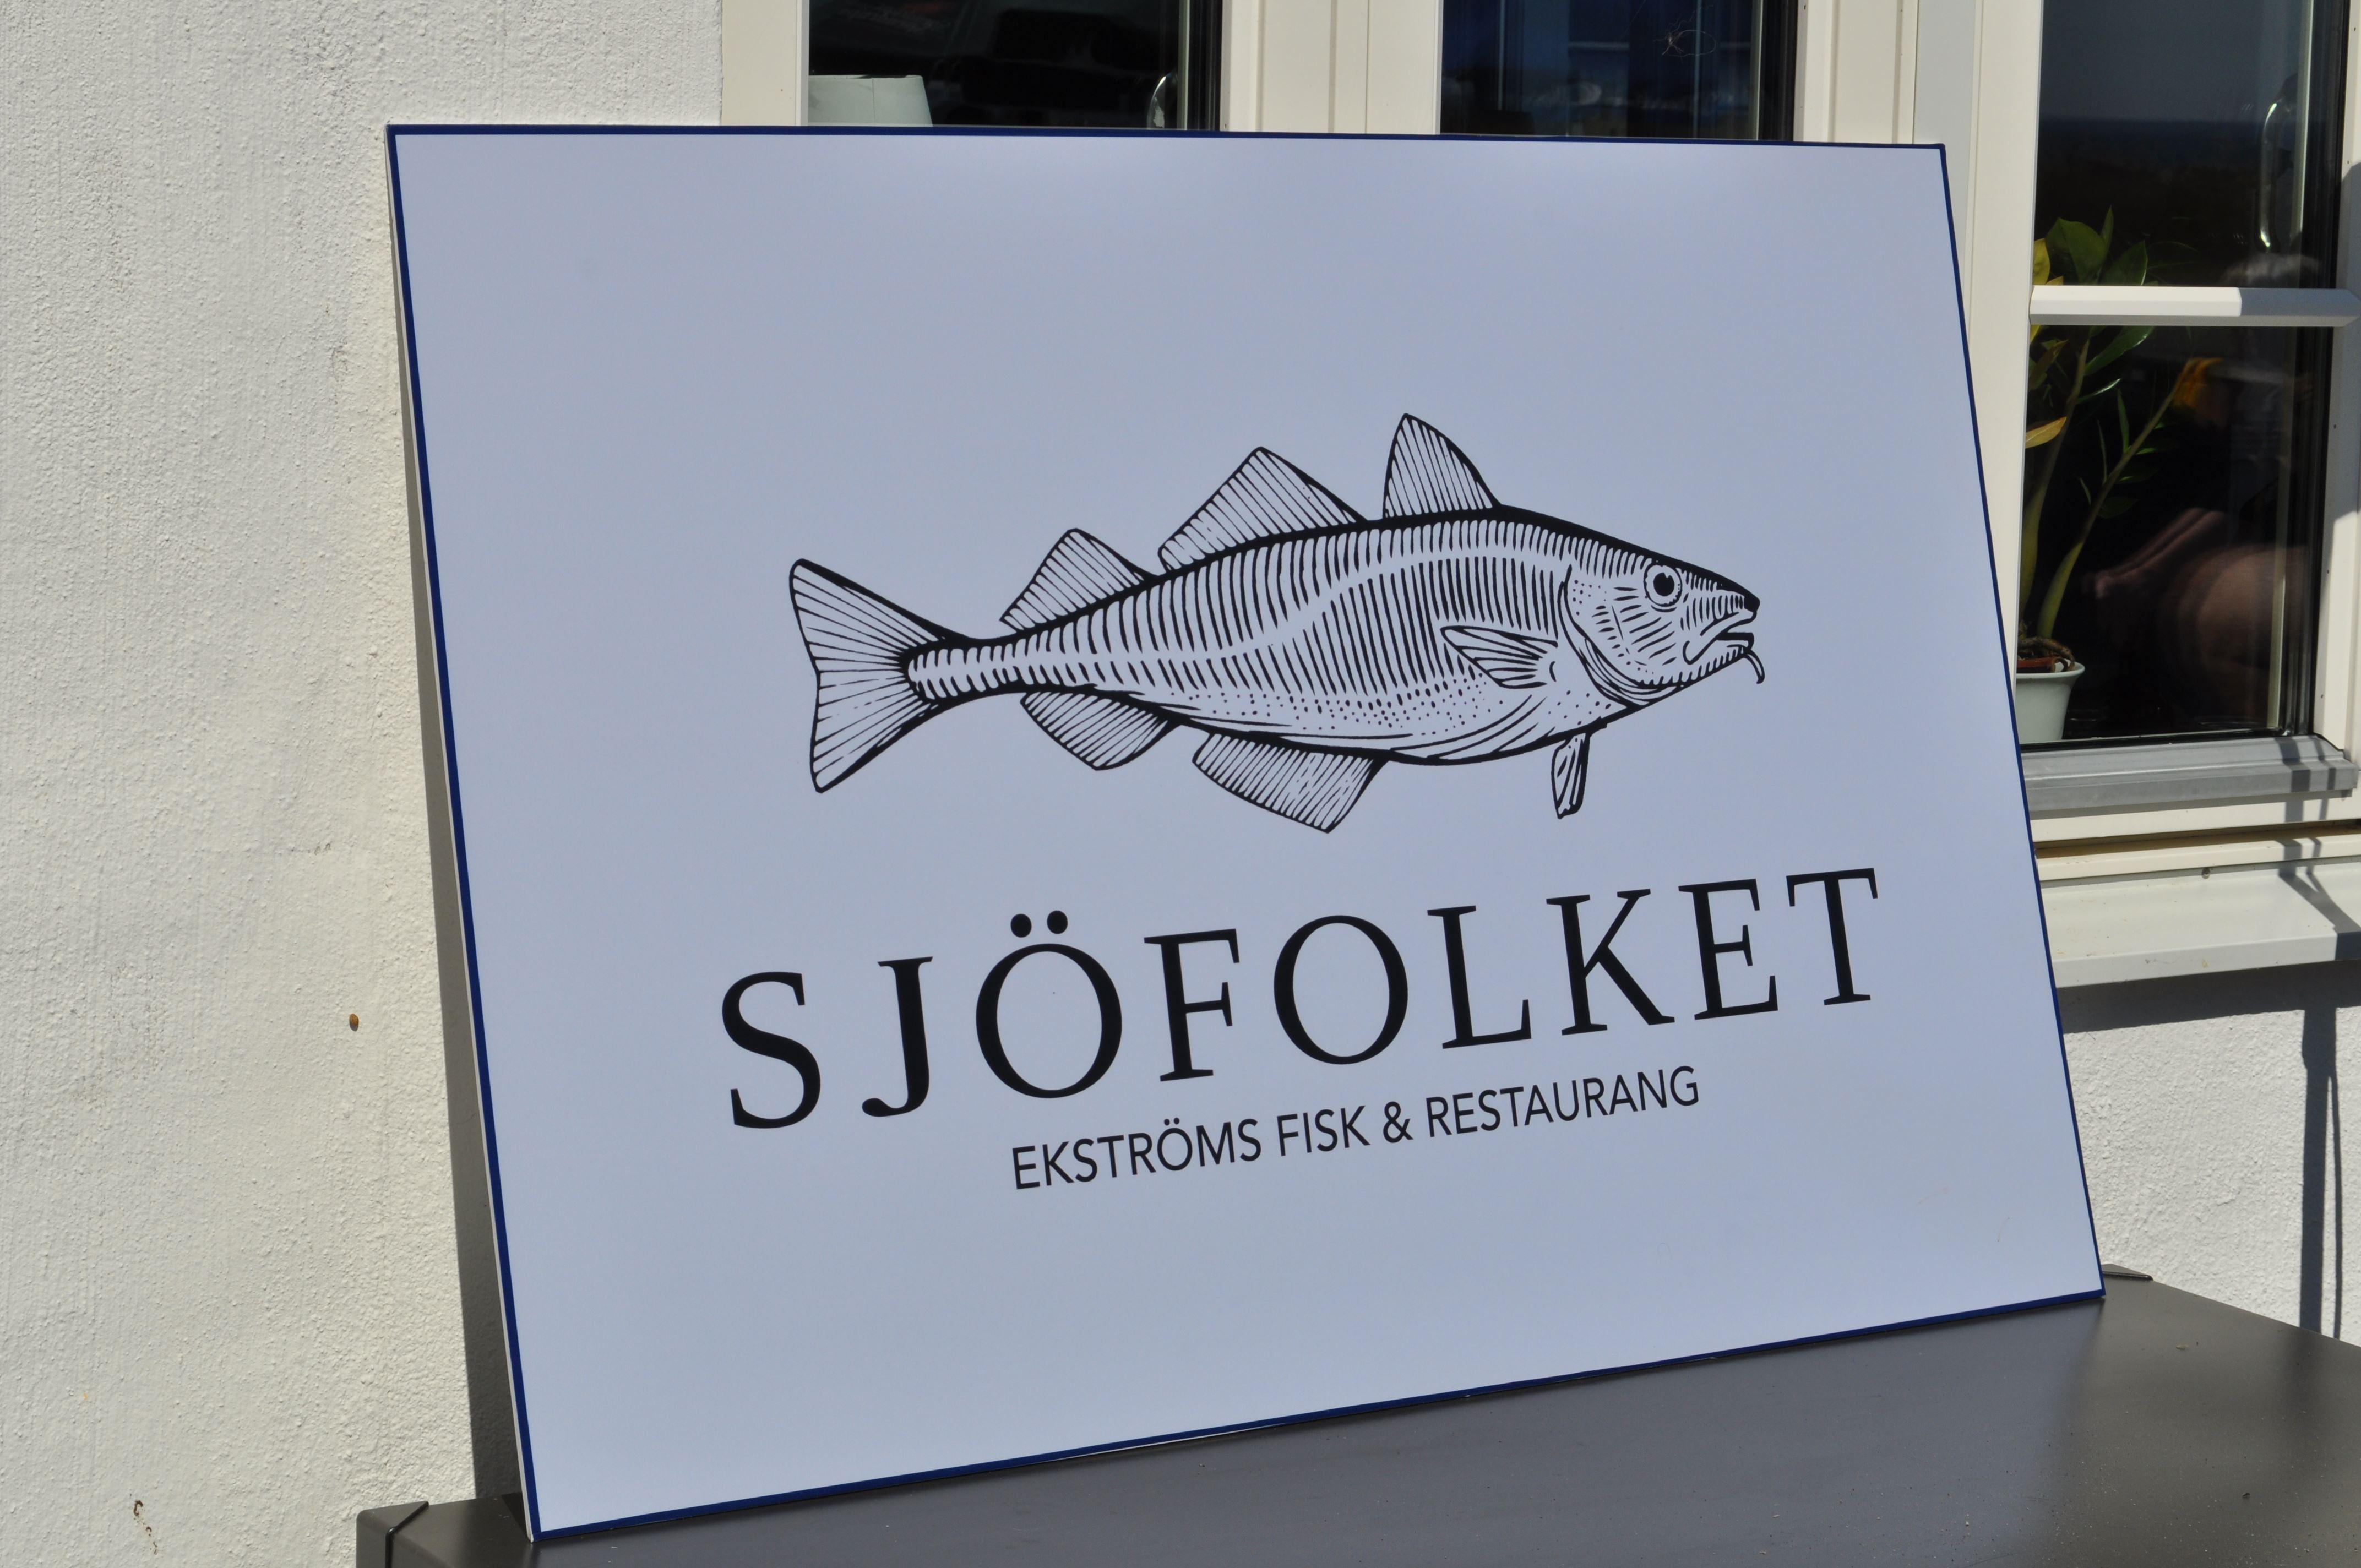 Sjöfolket Ekströms Fisk & Restaurang